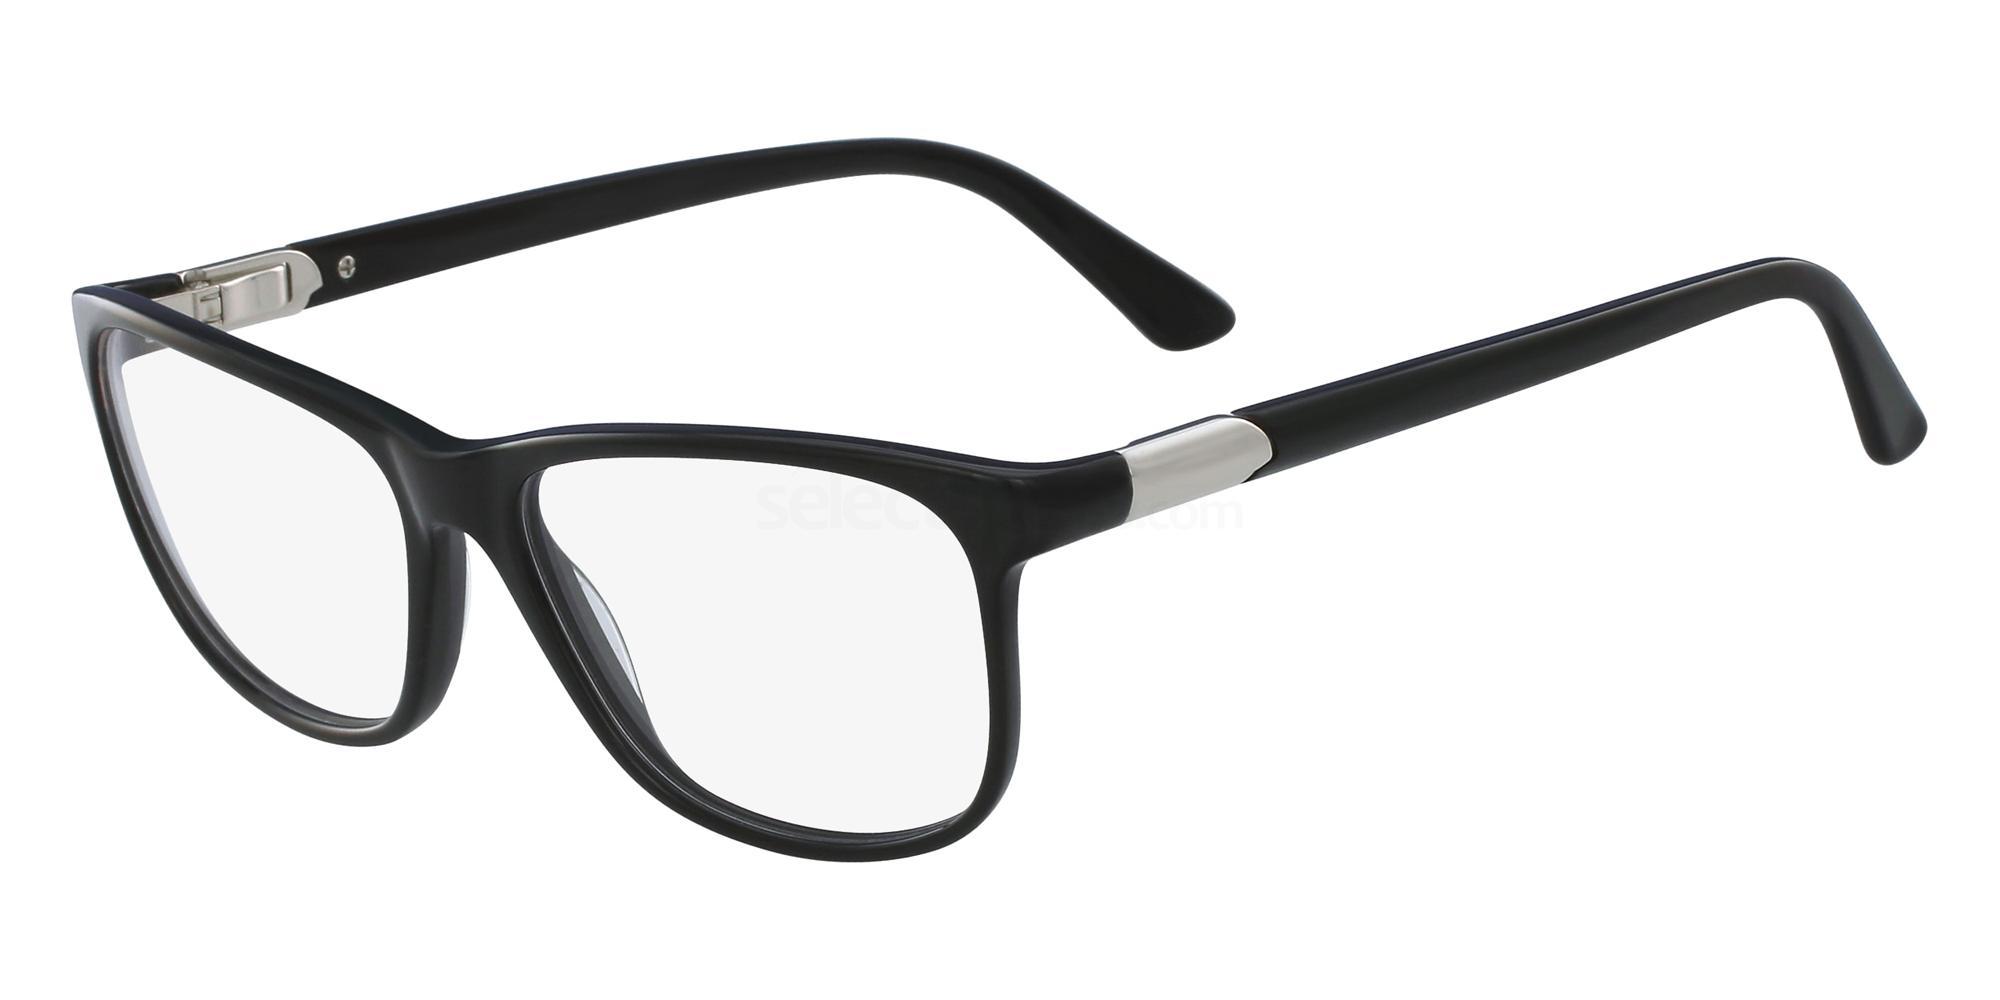 001 SKAGA 2708 BLOMKNOPP Glasses, Skaga